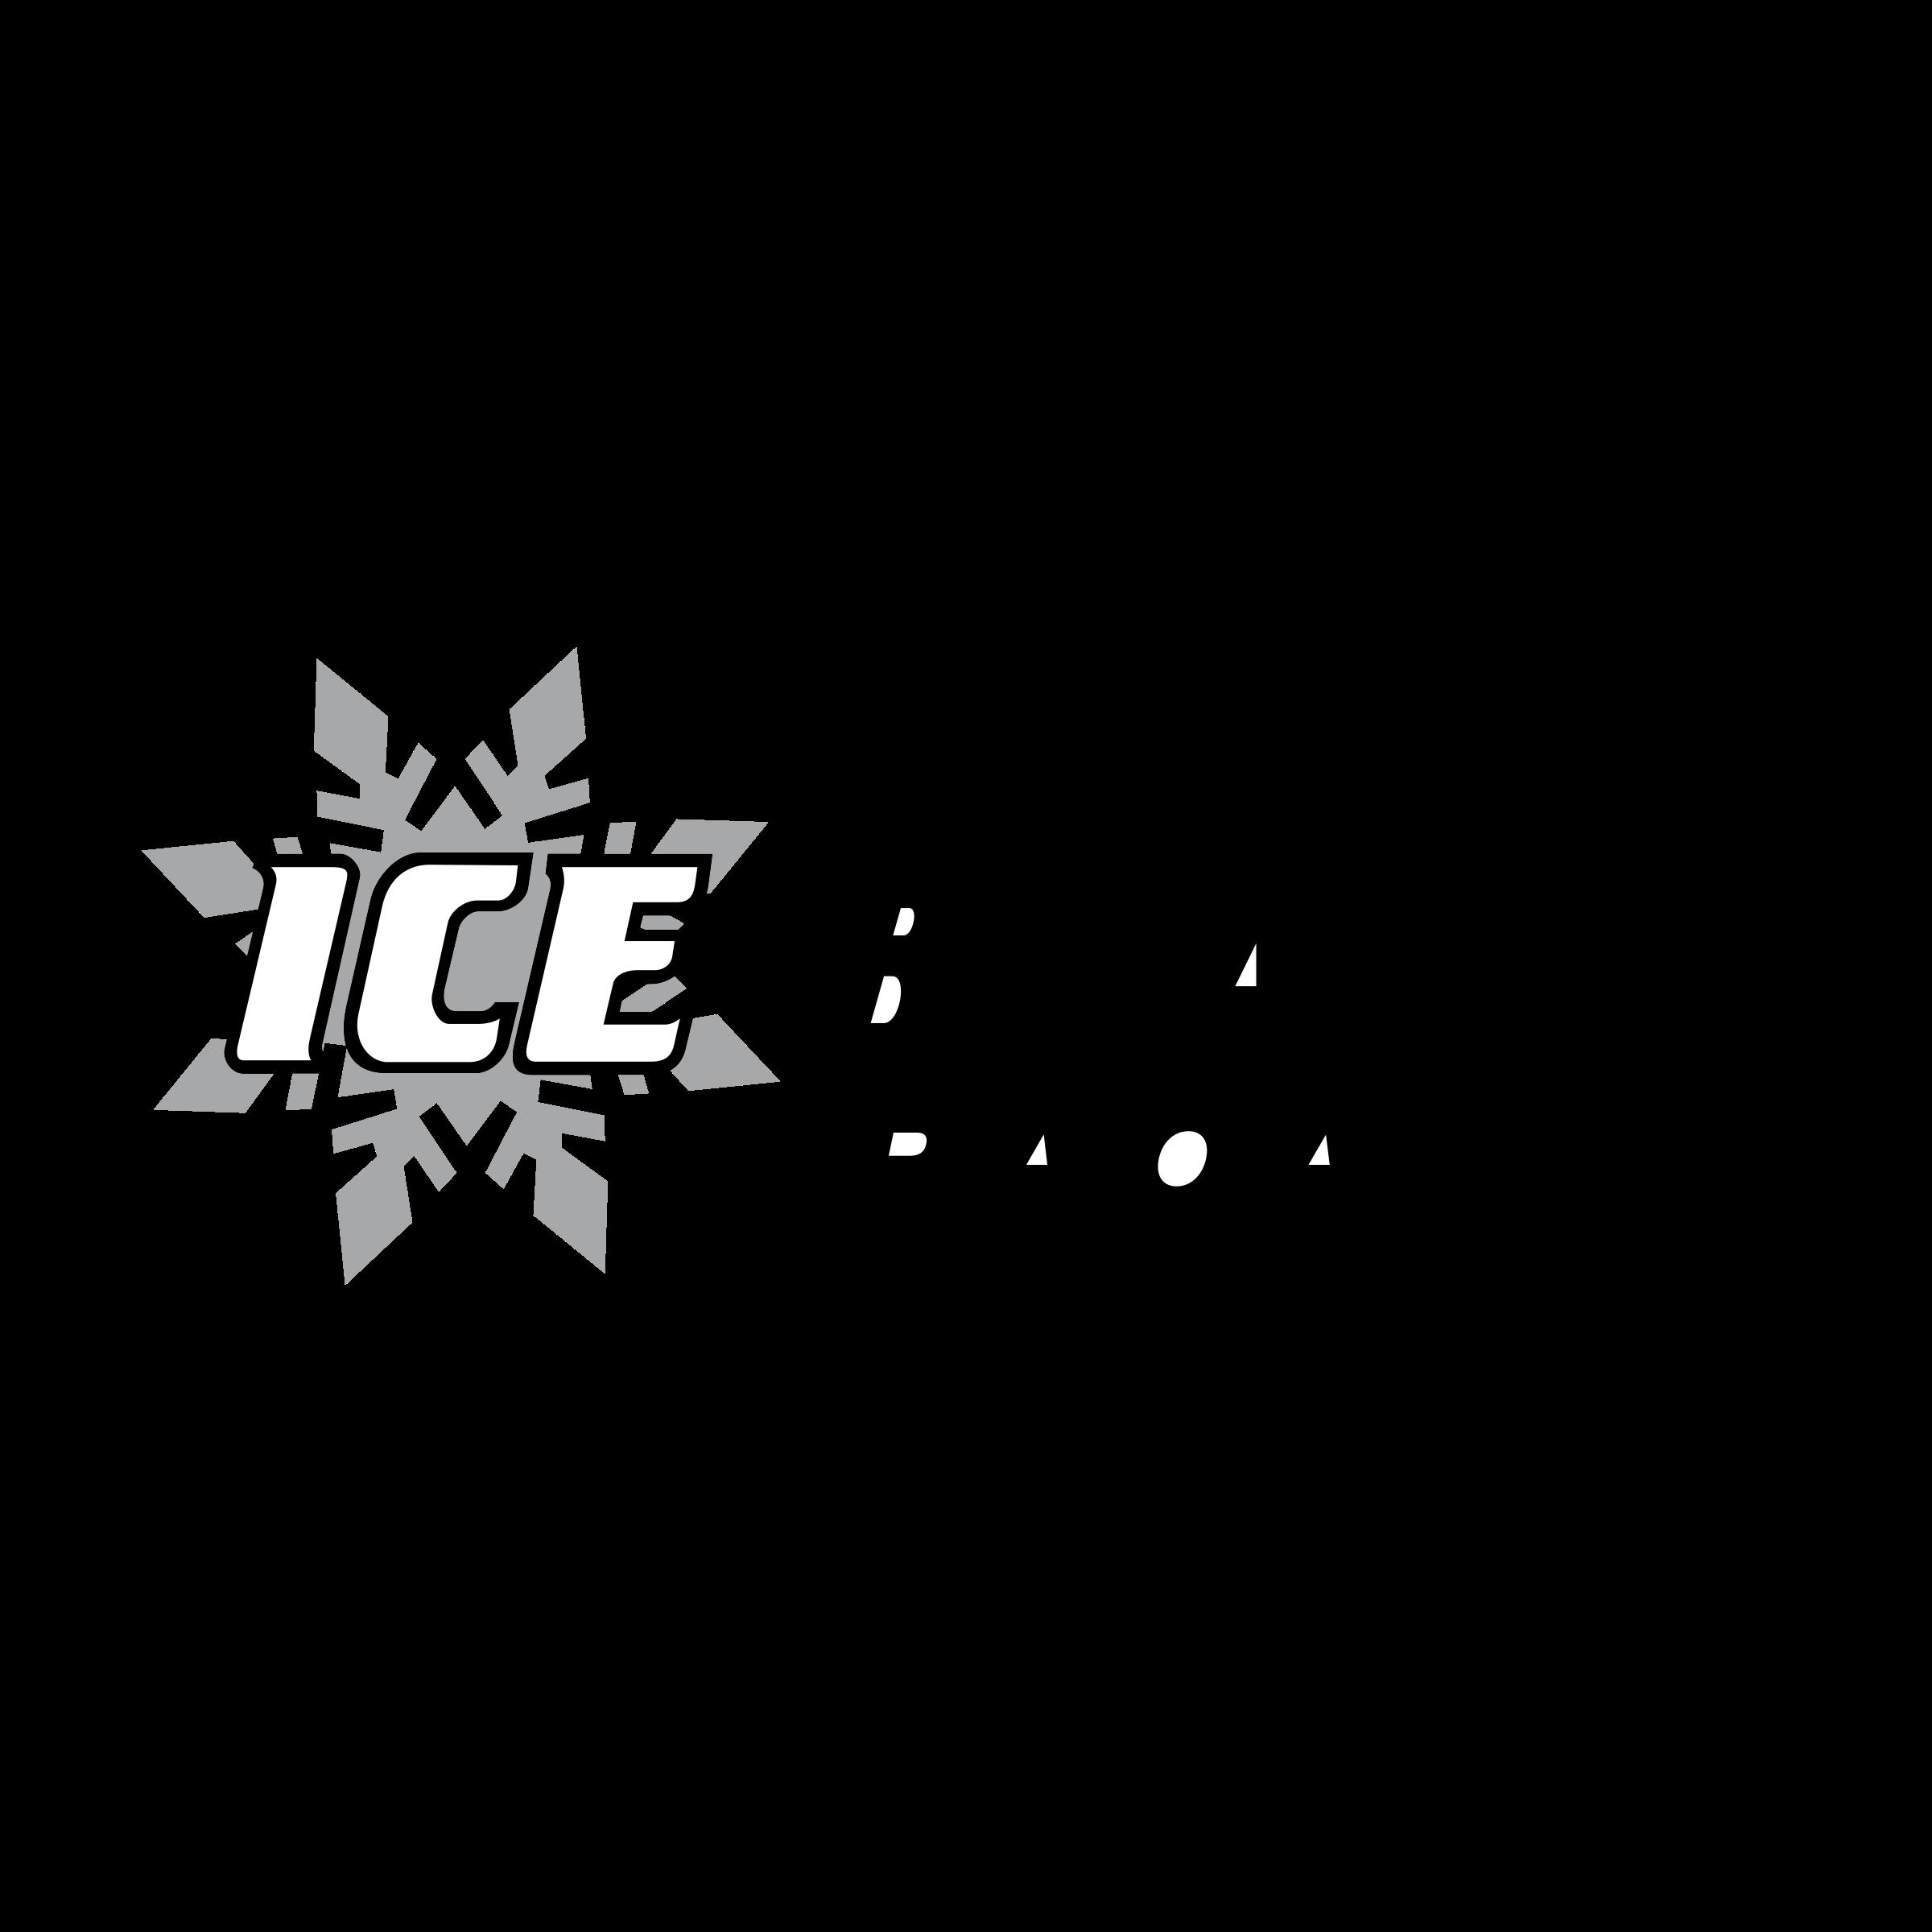 Ice Blast Logo PNG Transparent & SVG Vector.